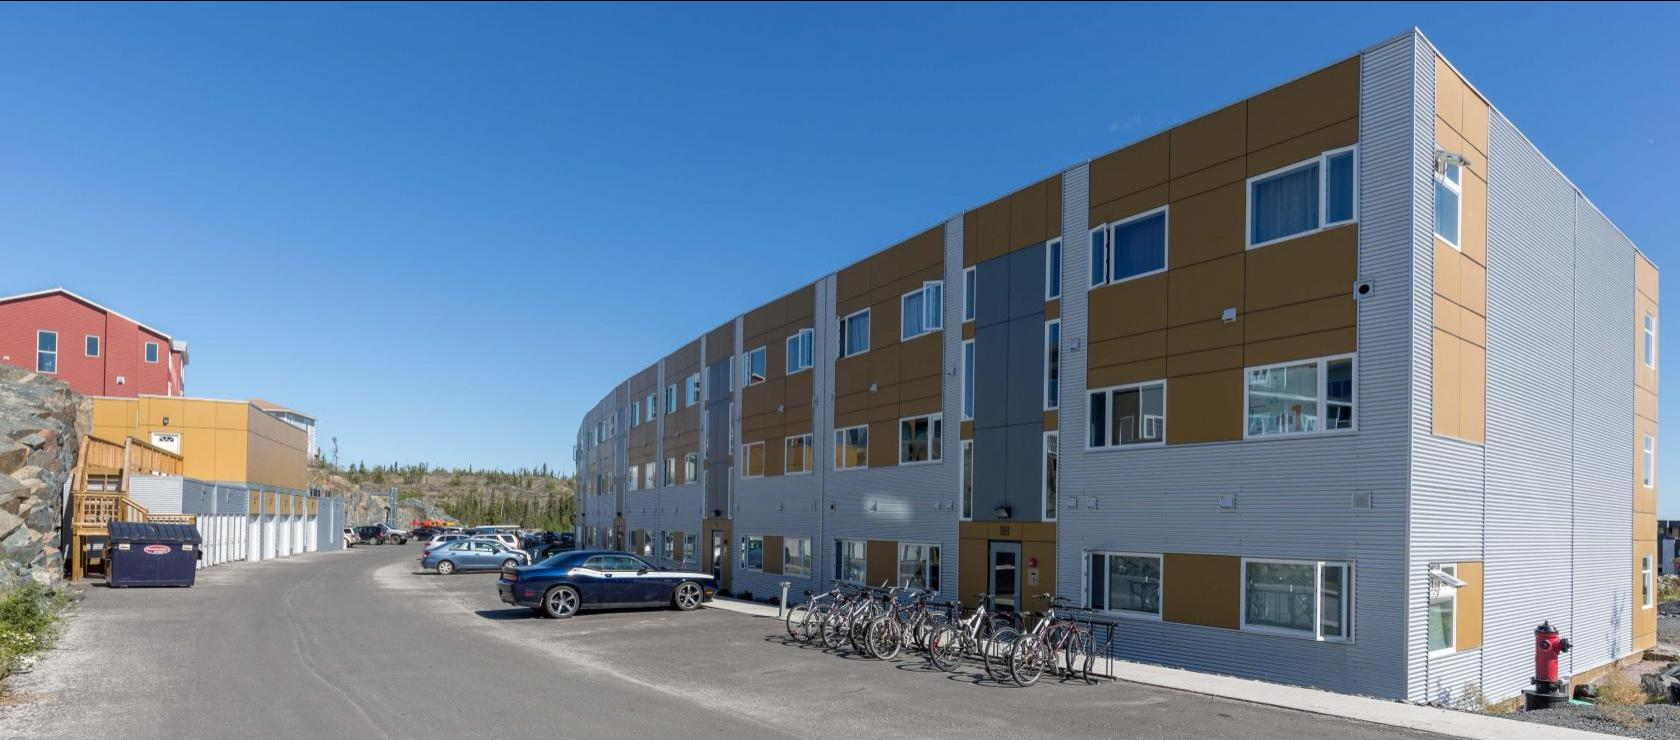 101 - 182 Niven Drive, Niven, Yellowknife 2